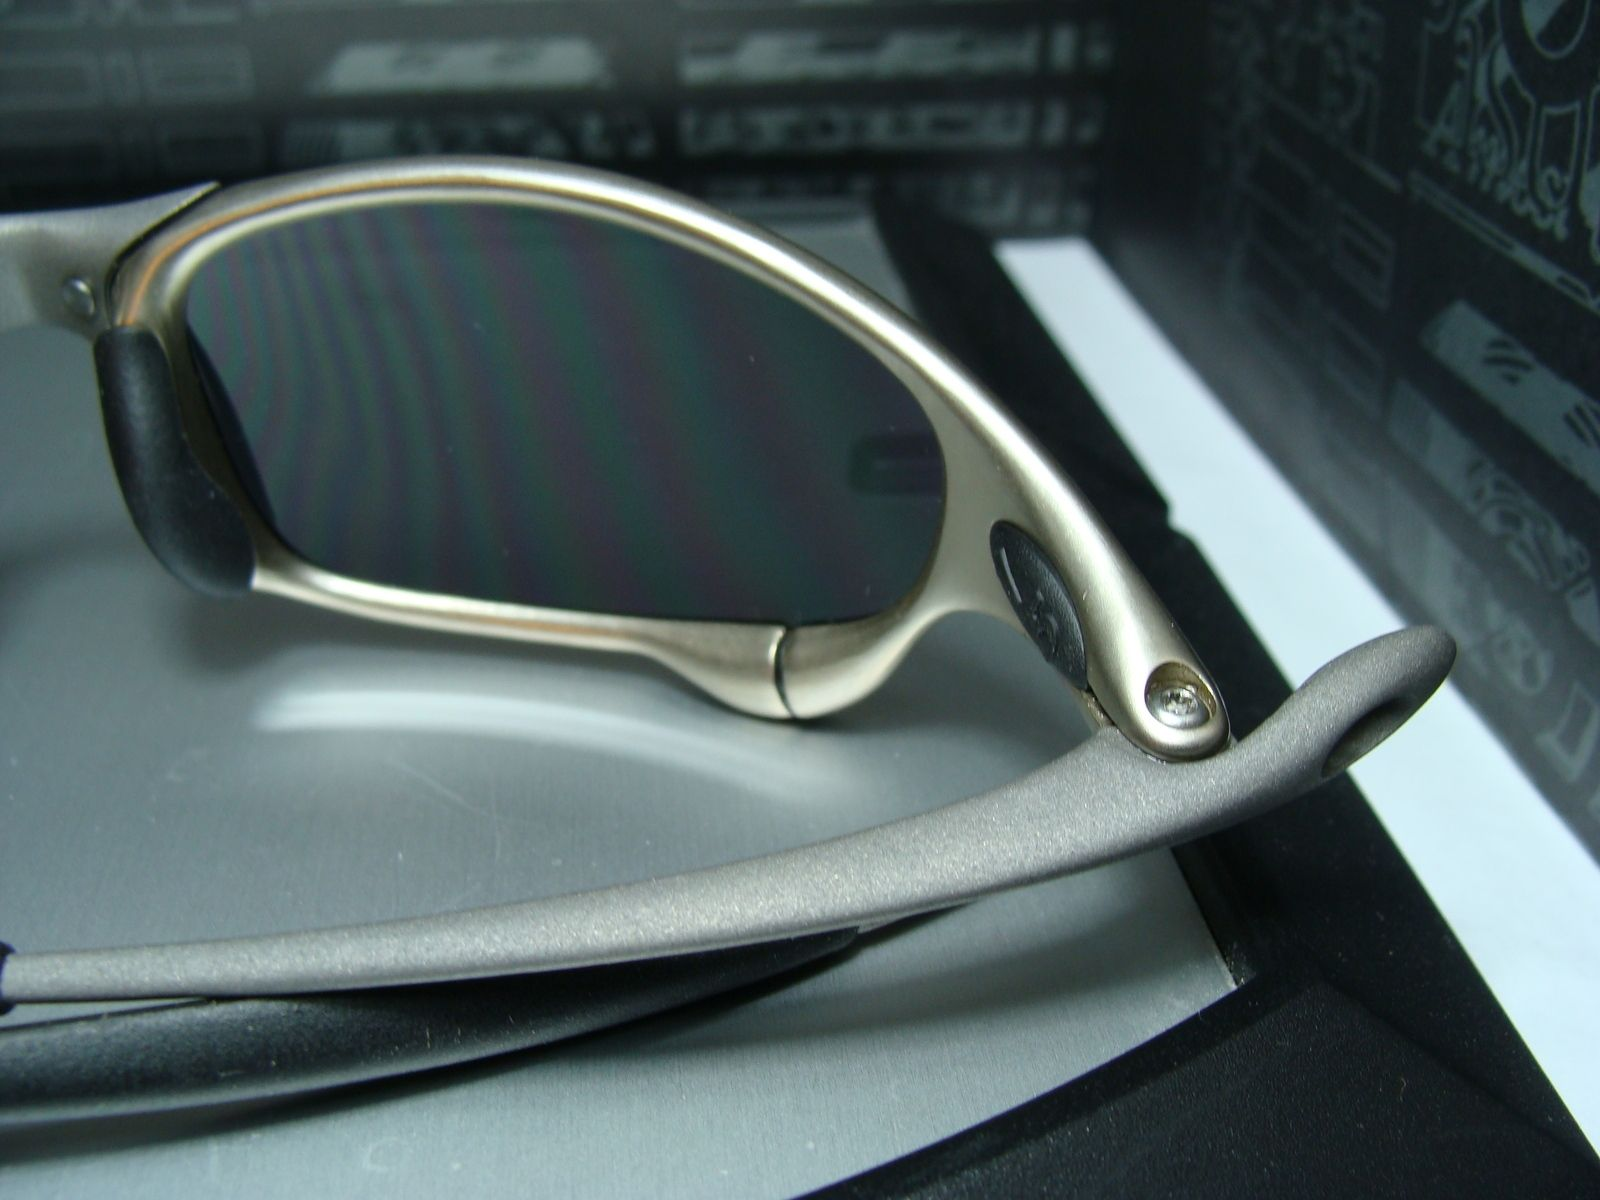 Juliet XMAN Ti-02,  Brand New Plasma Frame Turned Into A Ti-02, W/ New Black Lenses - DSC04876.JPG